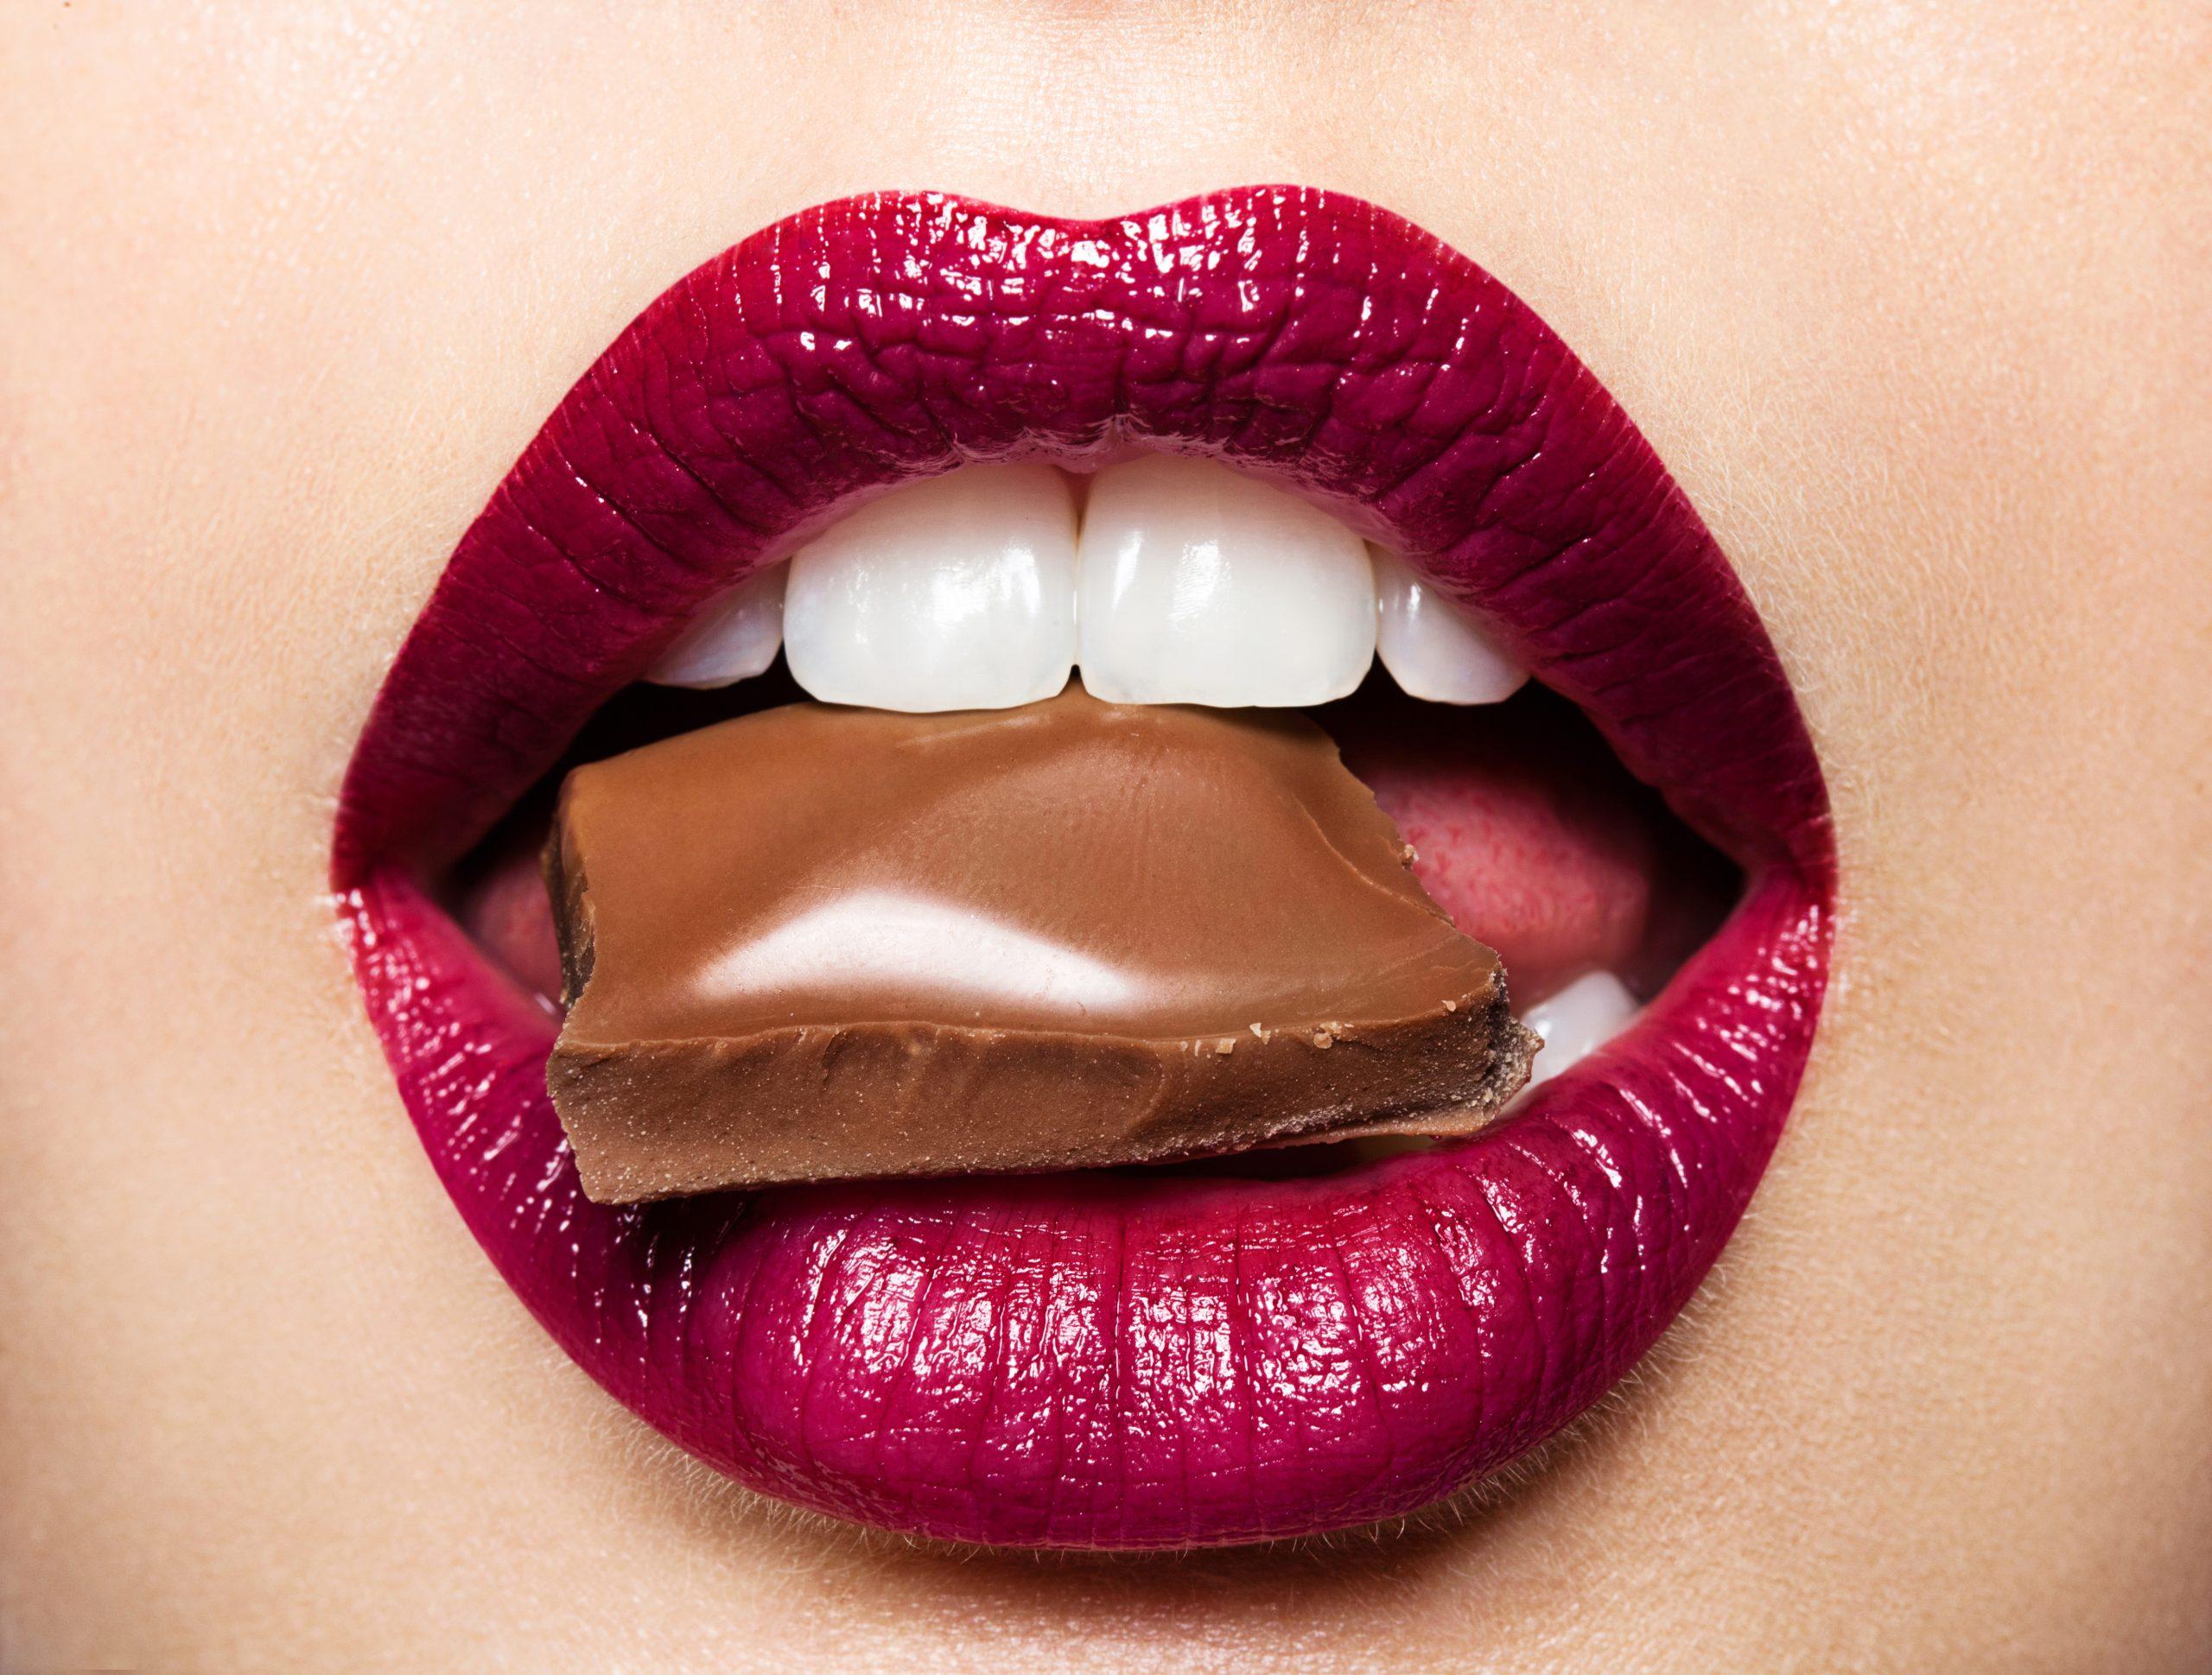 Beautiful female lips with chocolate